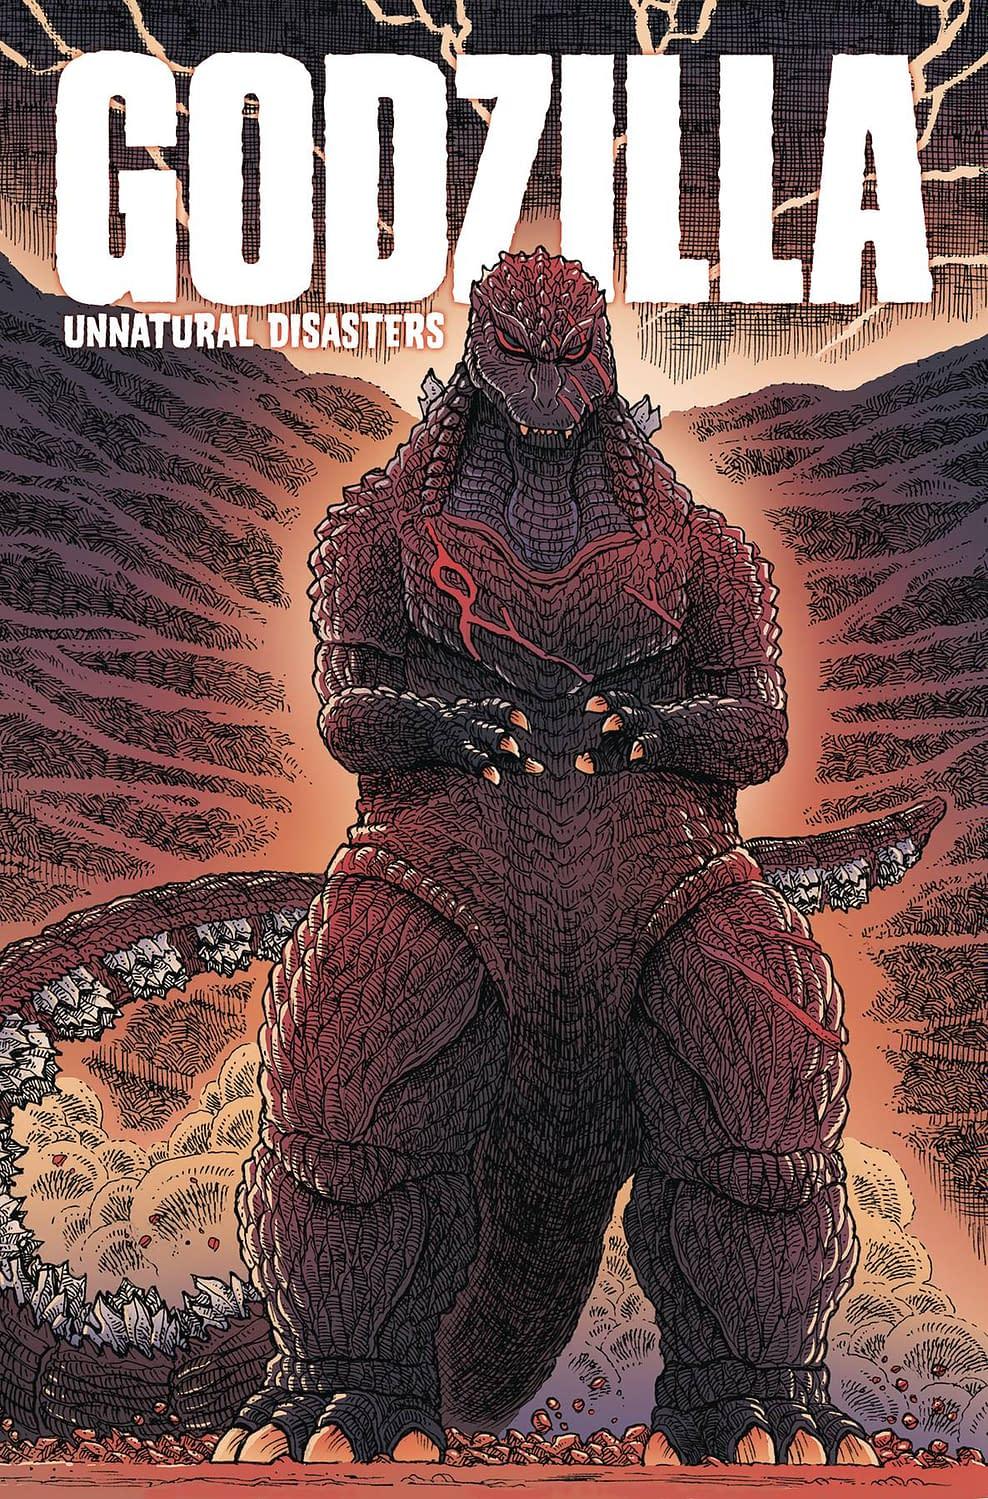 IDW Full Solicitations For March 2021 With Godzilla, Disney & GI Joe GODZILLA UNNATURAL DISASTERS TP